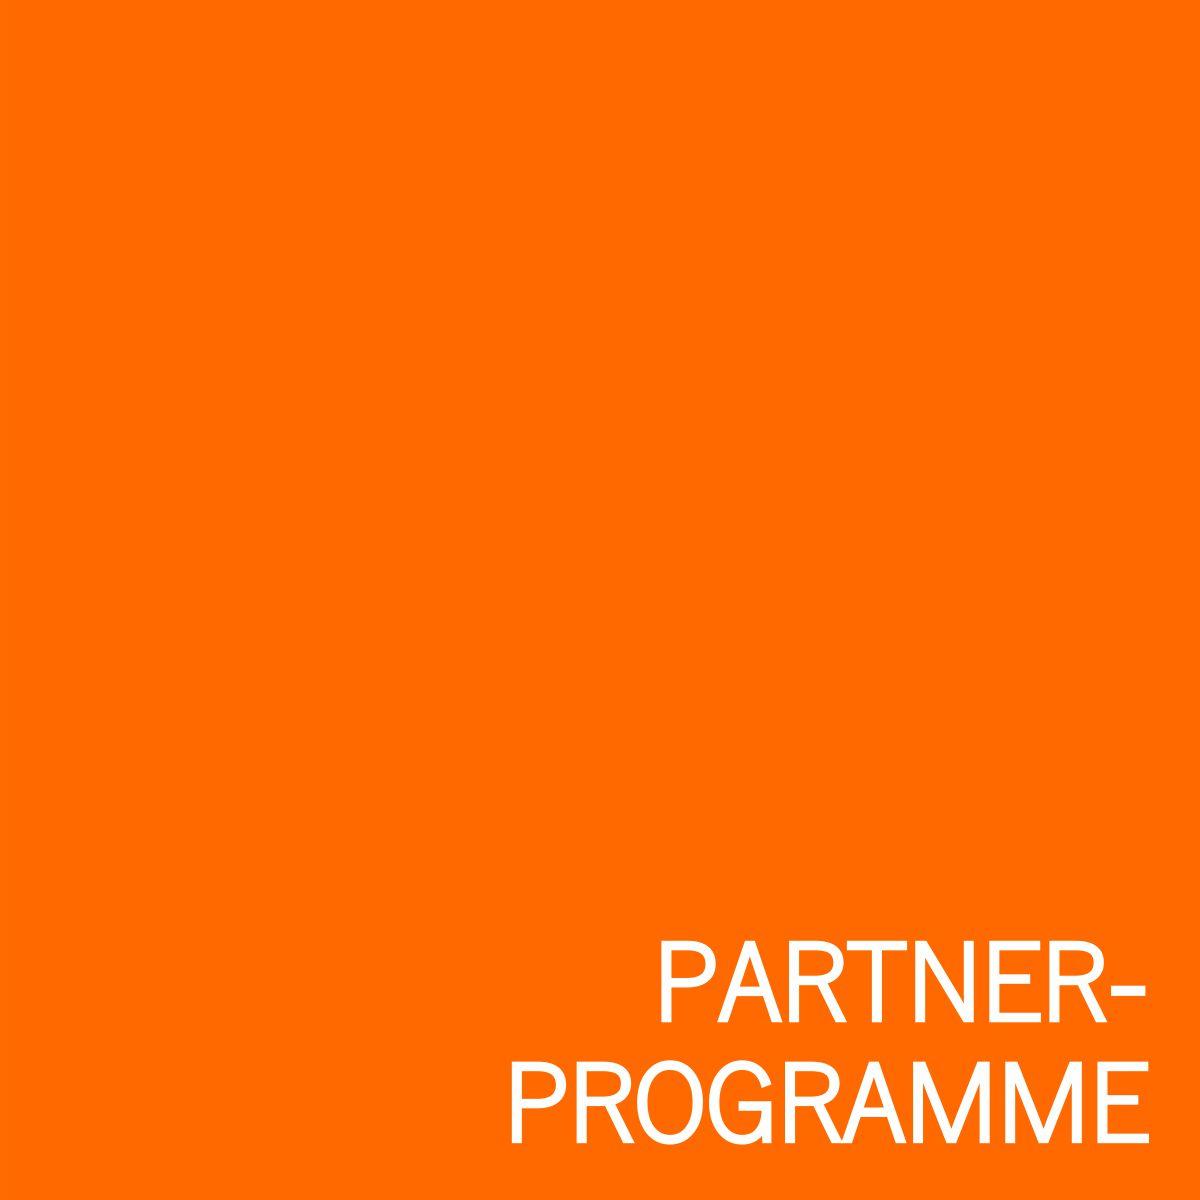 Partner-Programme - Kundenbindungsprogramme, Kundenclubs, Prämien-Programme